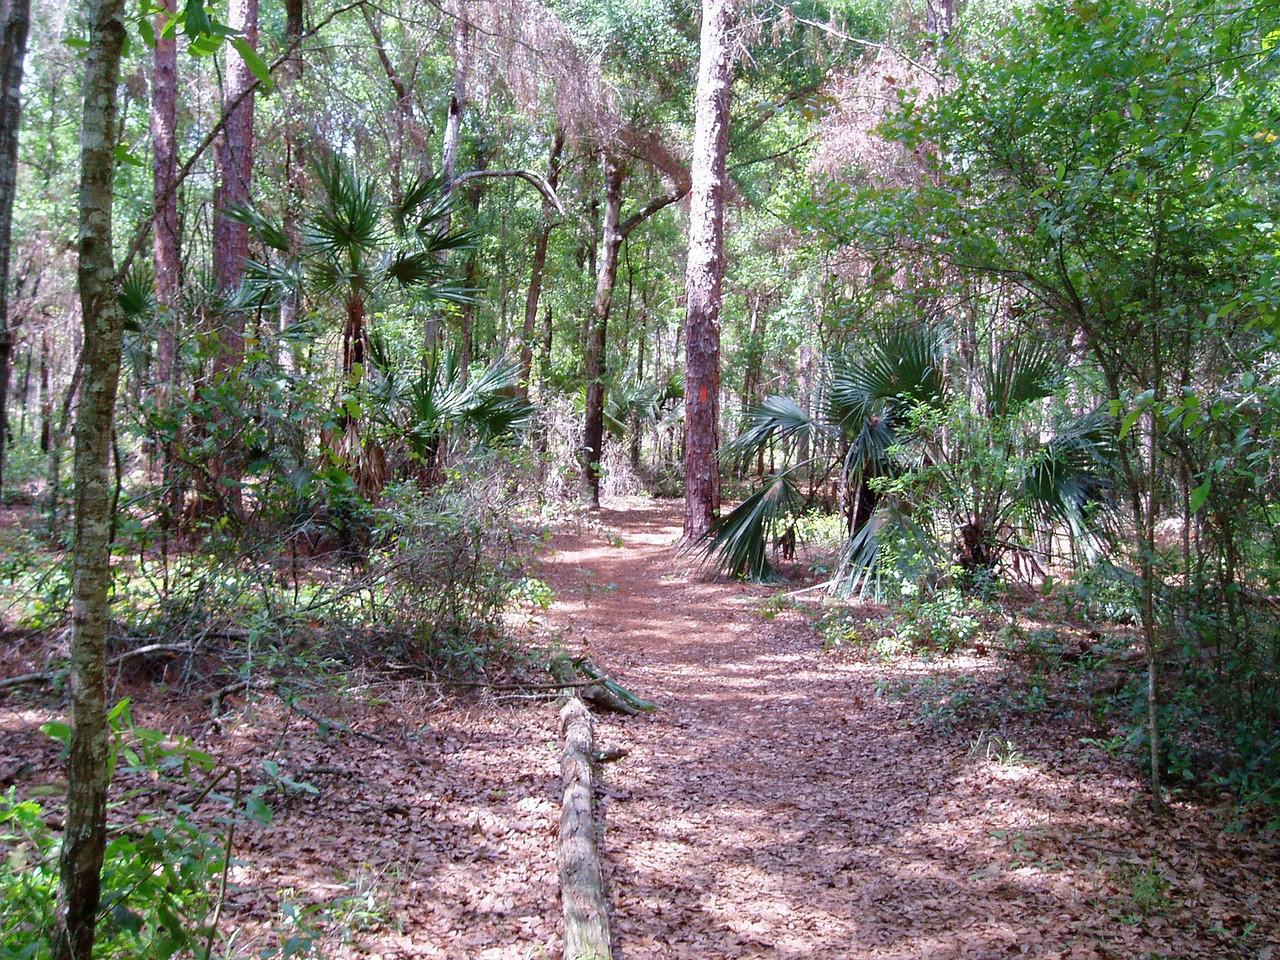 Florida Trail through Lower Wekiva Preserve State Park along SR 46 west of Sanford<br /> photo credit: FTA / Deb Blick